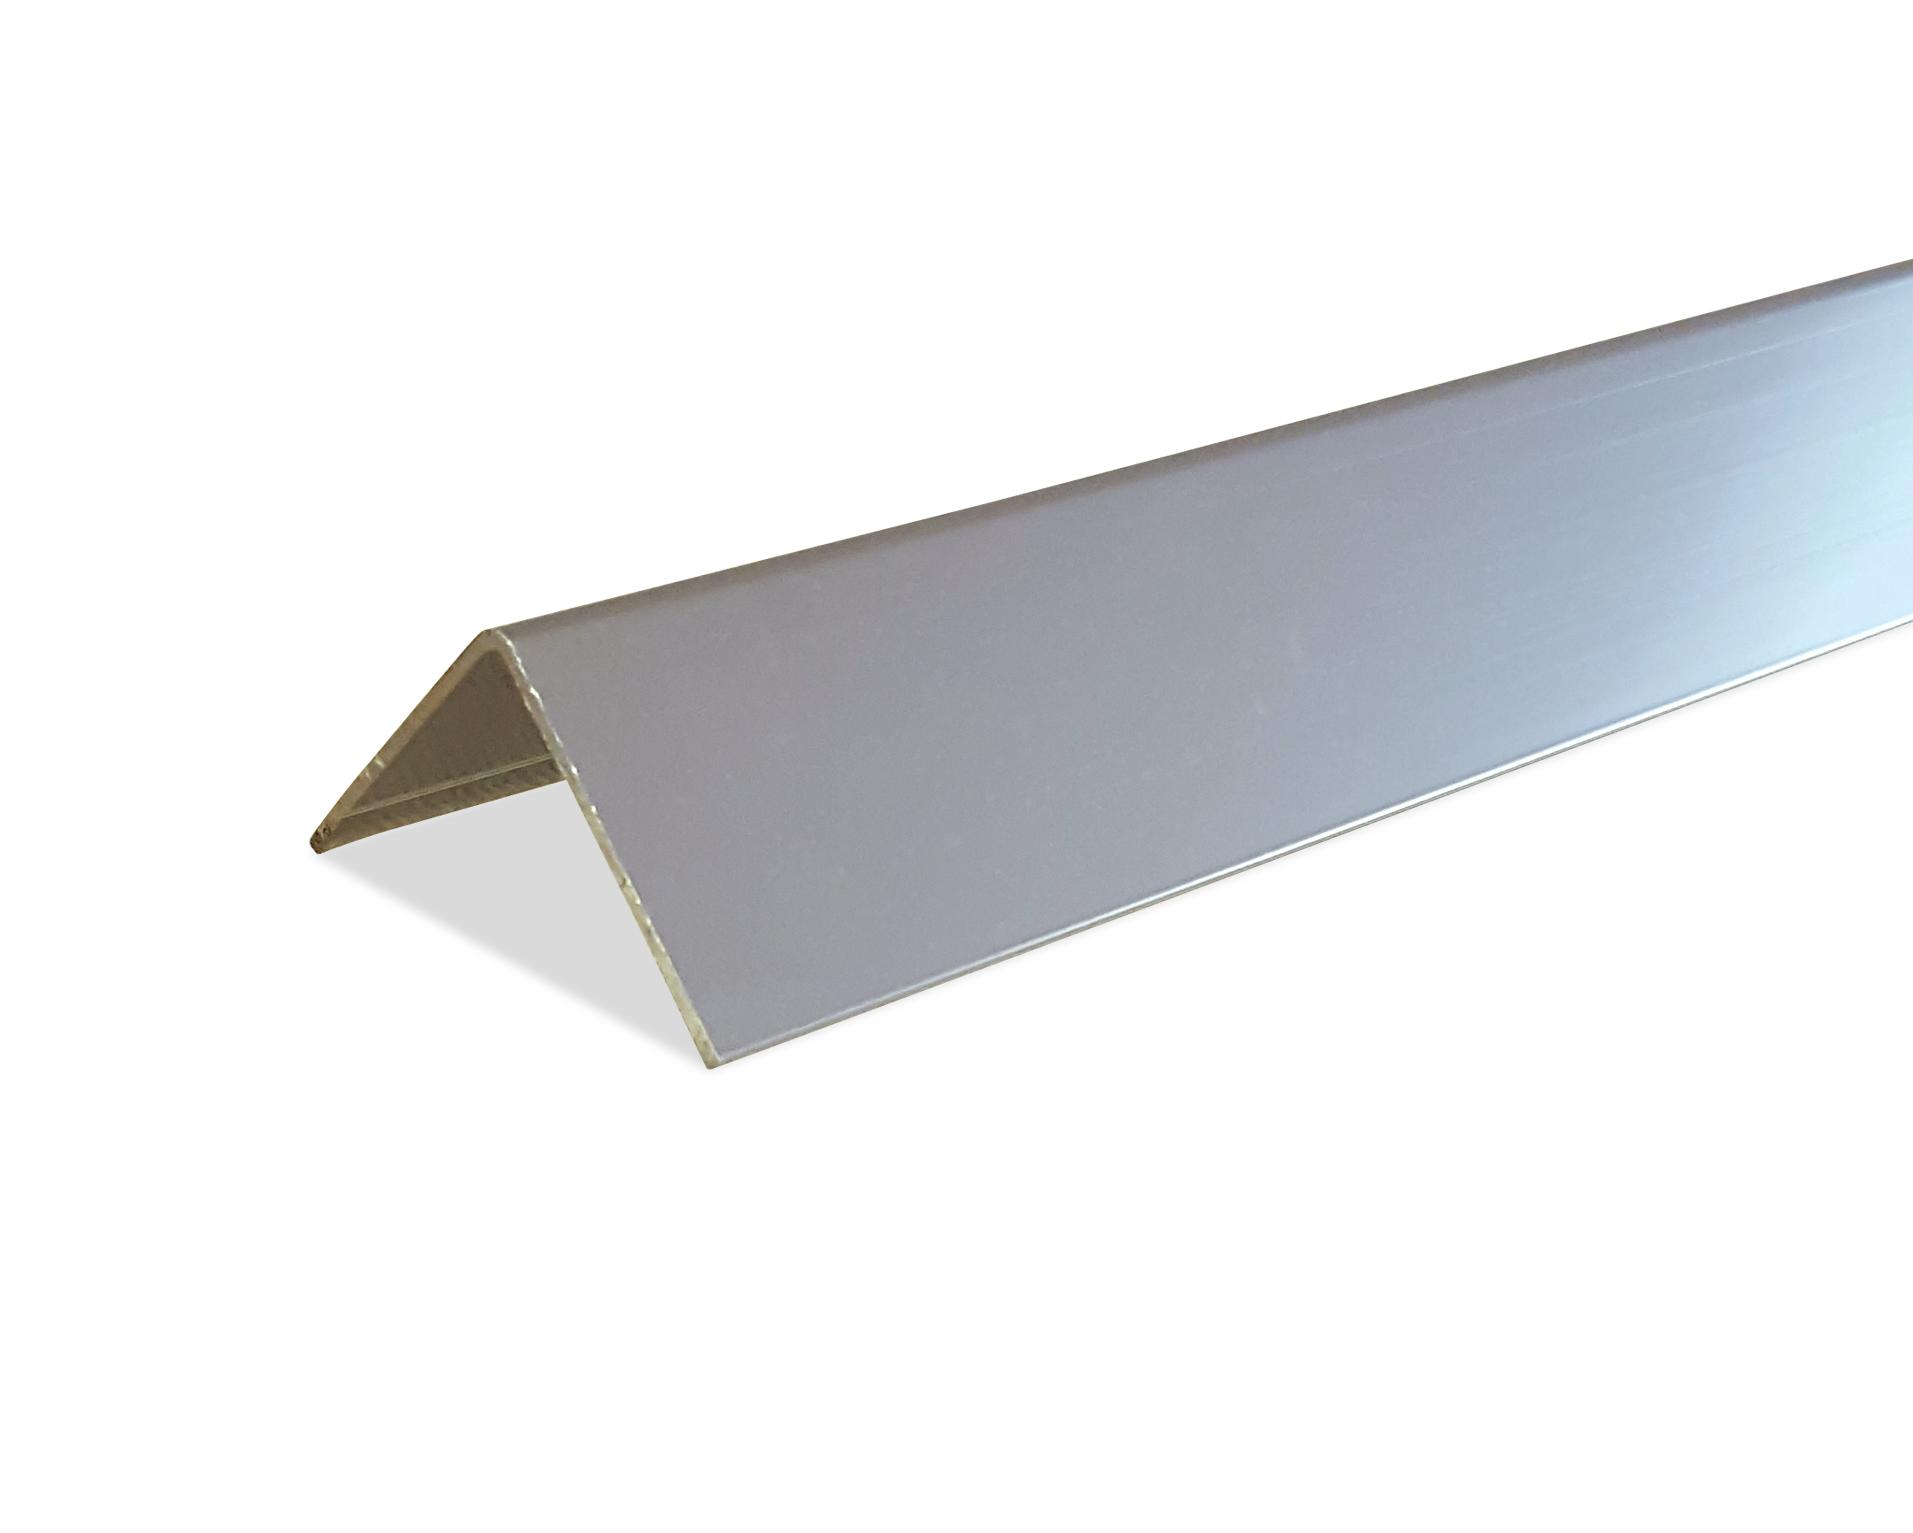 TITAN Panels Aluminium Rigid Angle